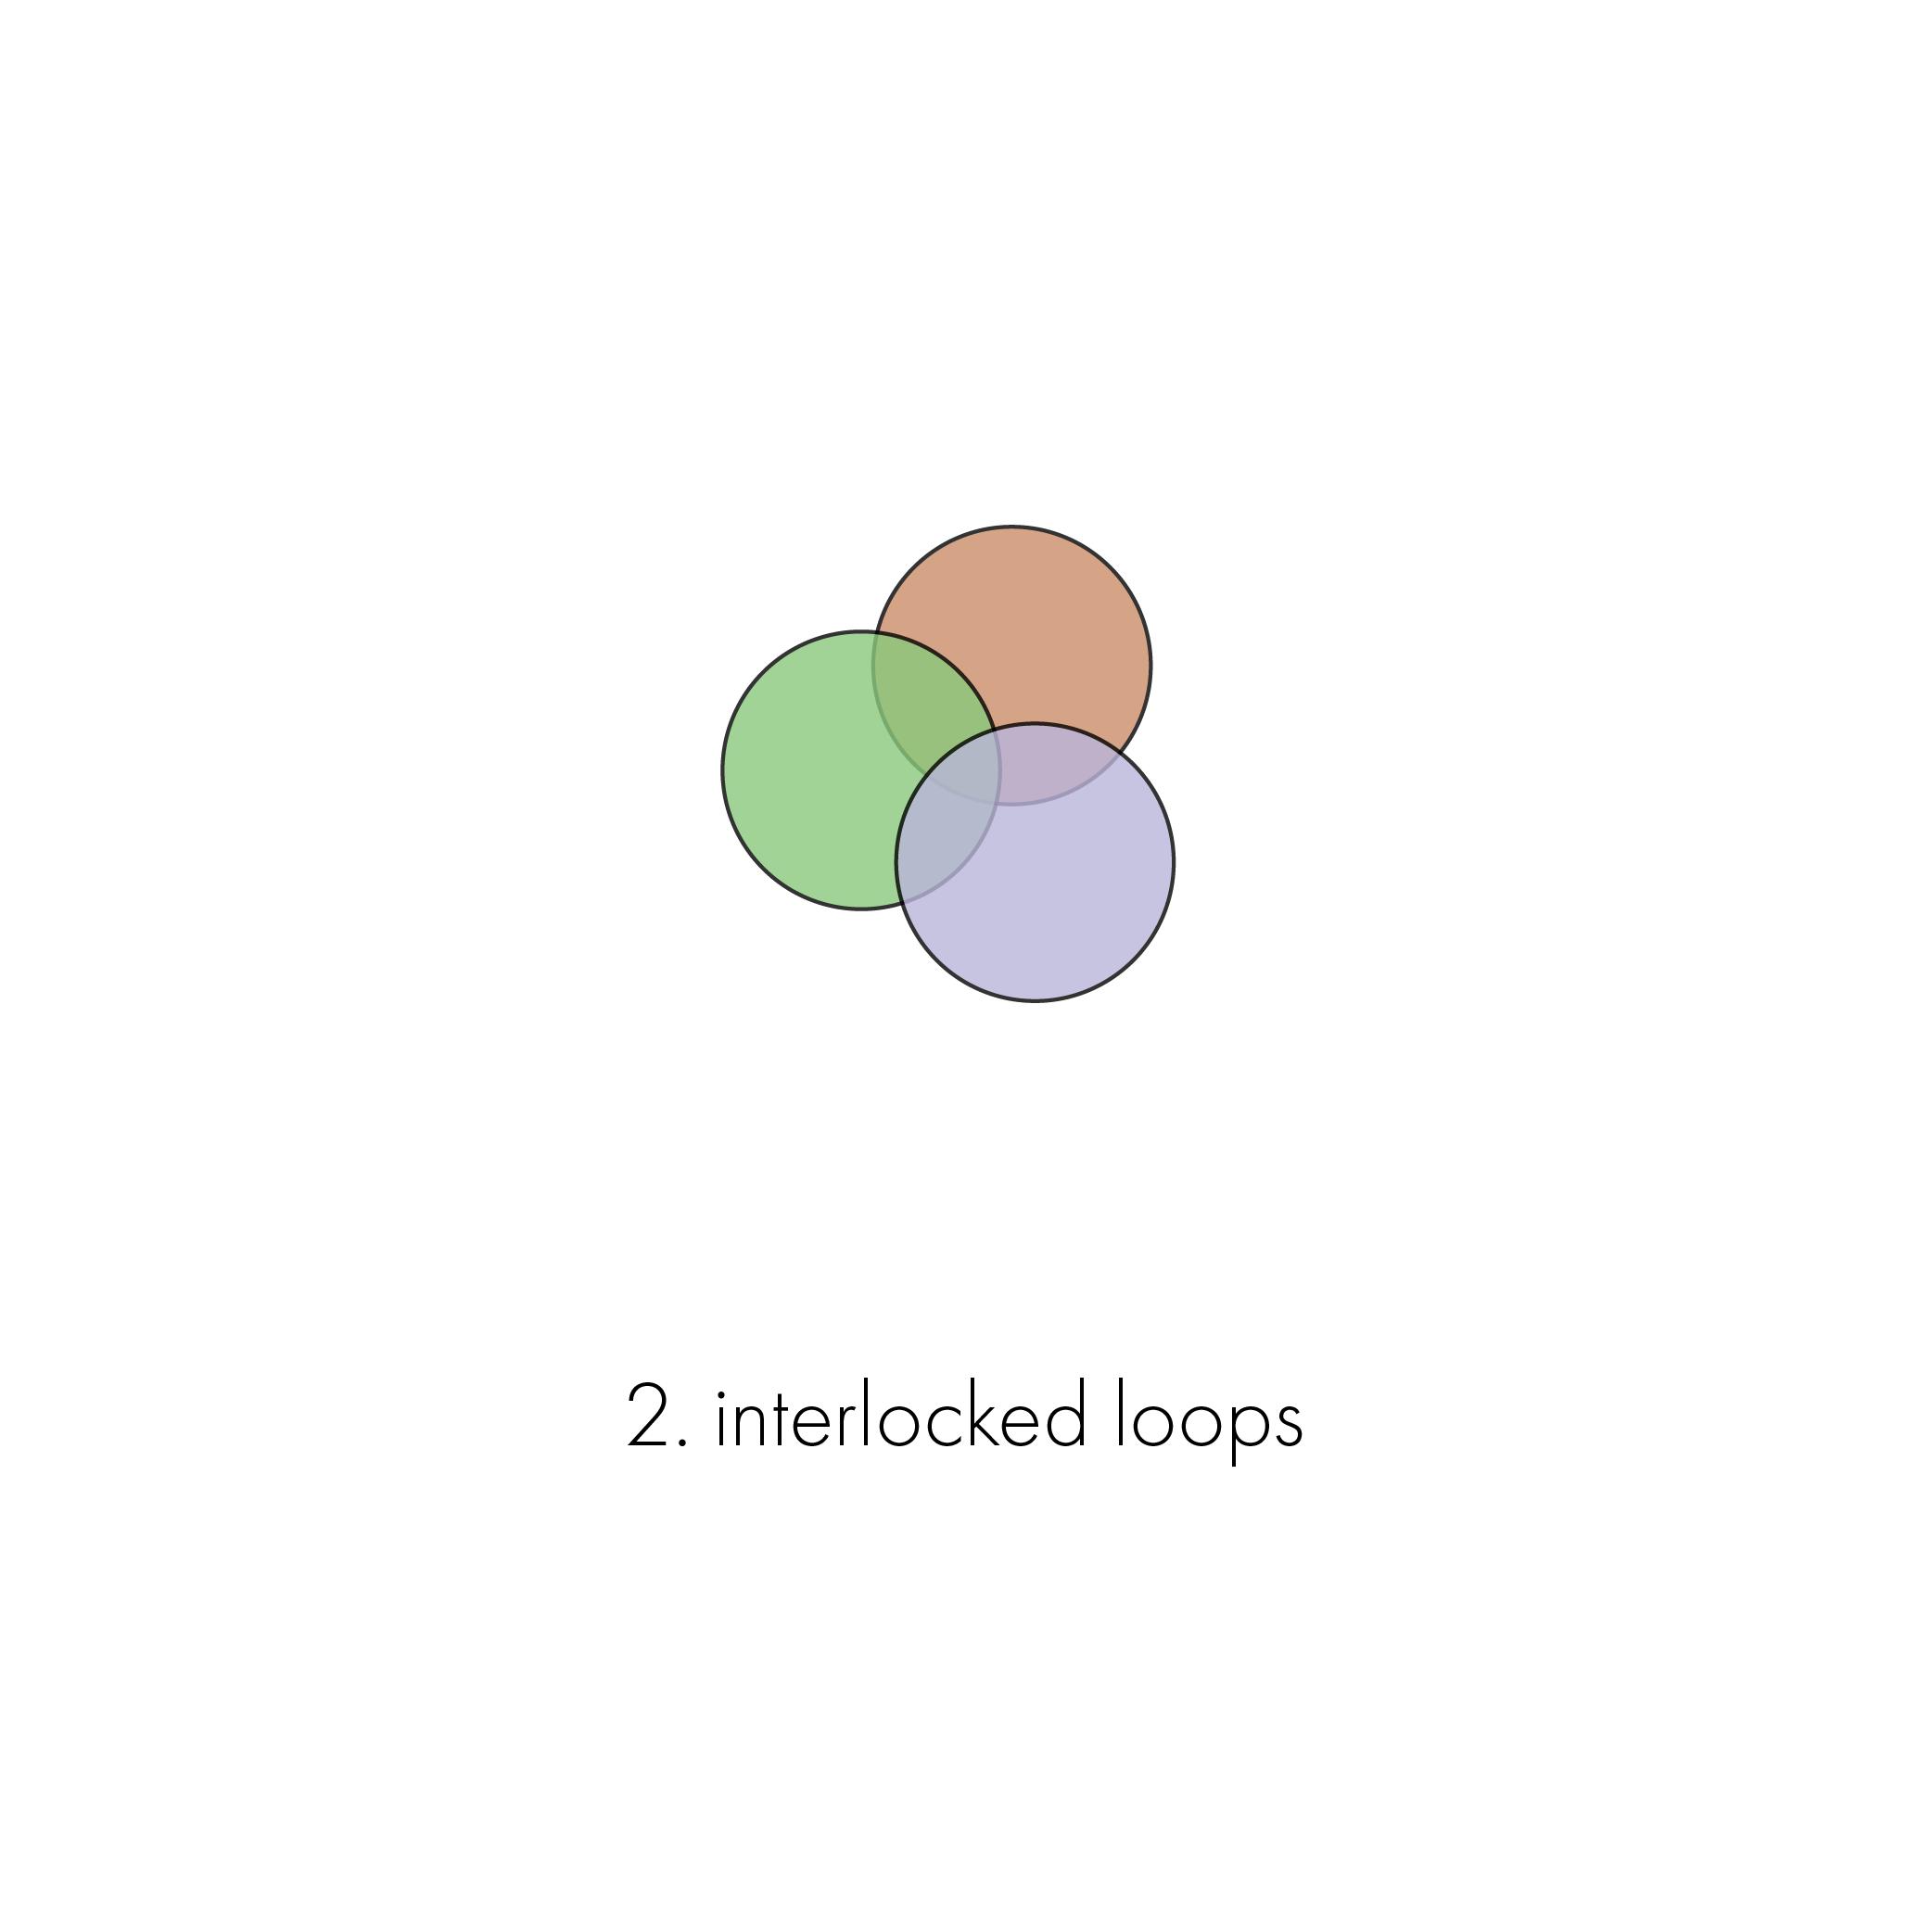 Diagrams-web-02.png